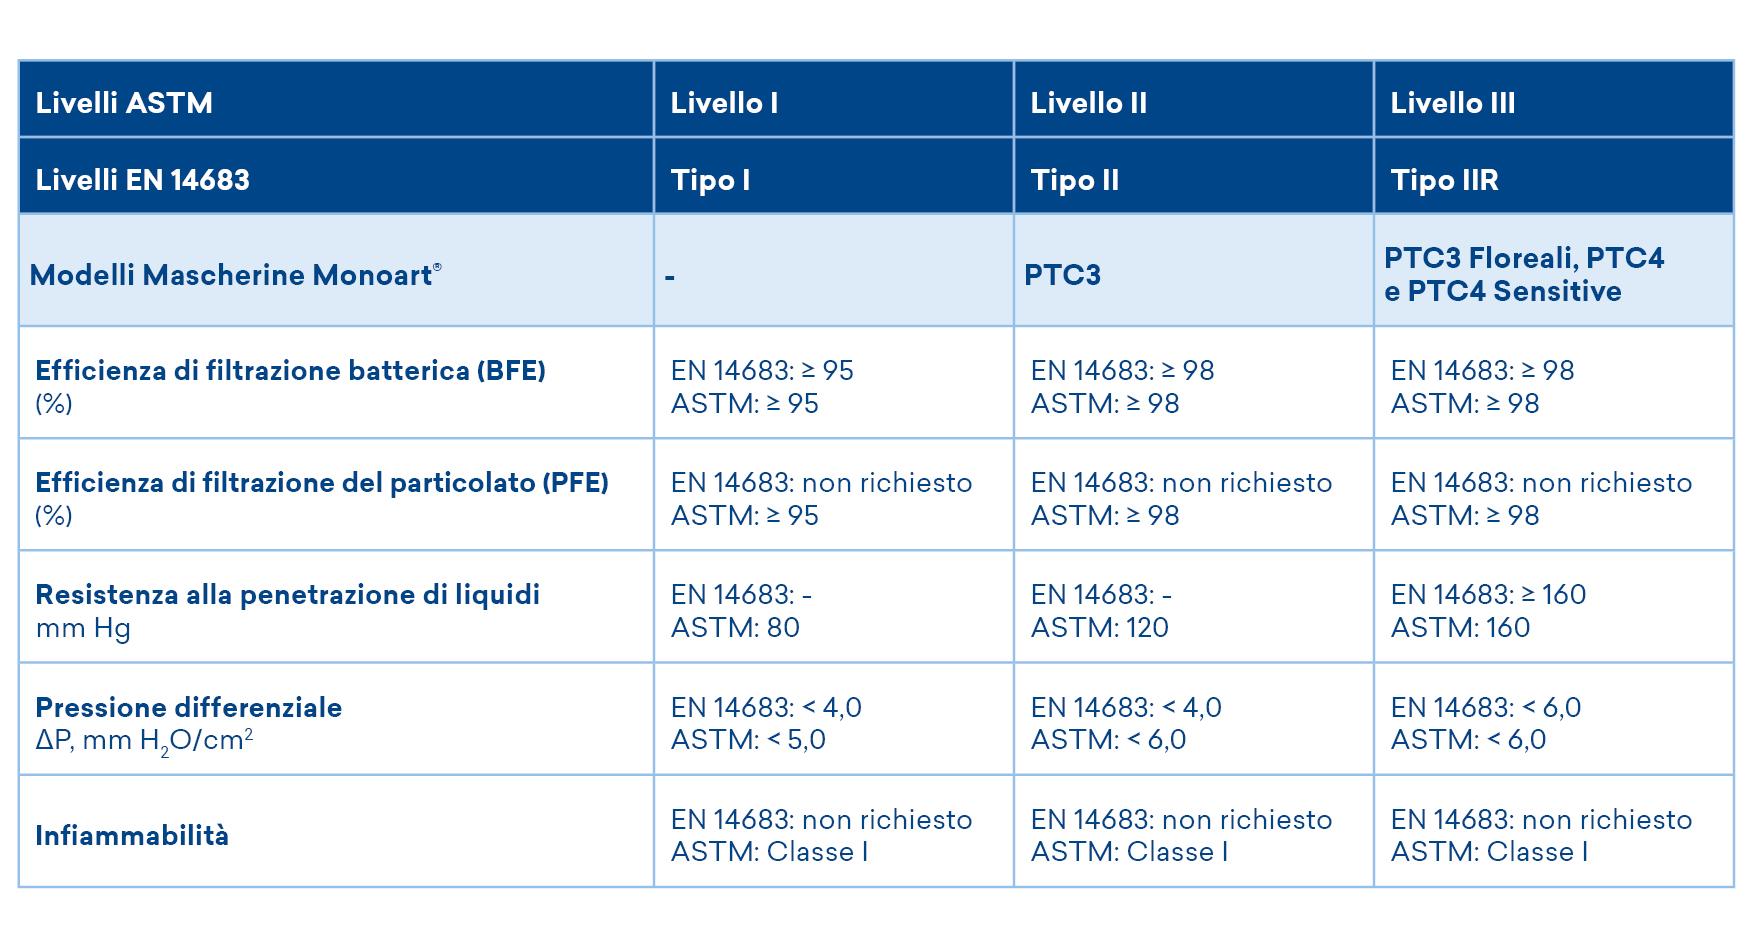 tabella livelli ASTM e EN 14683 mascherine